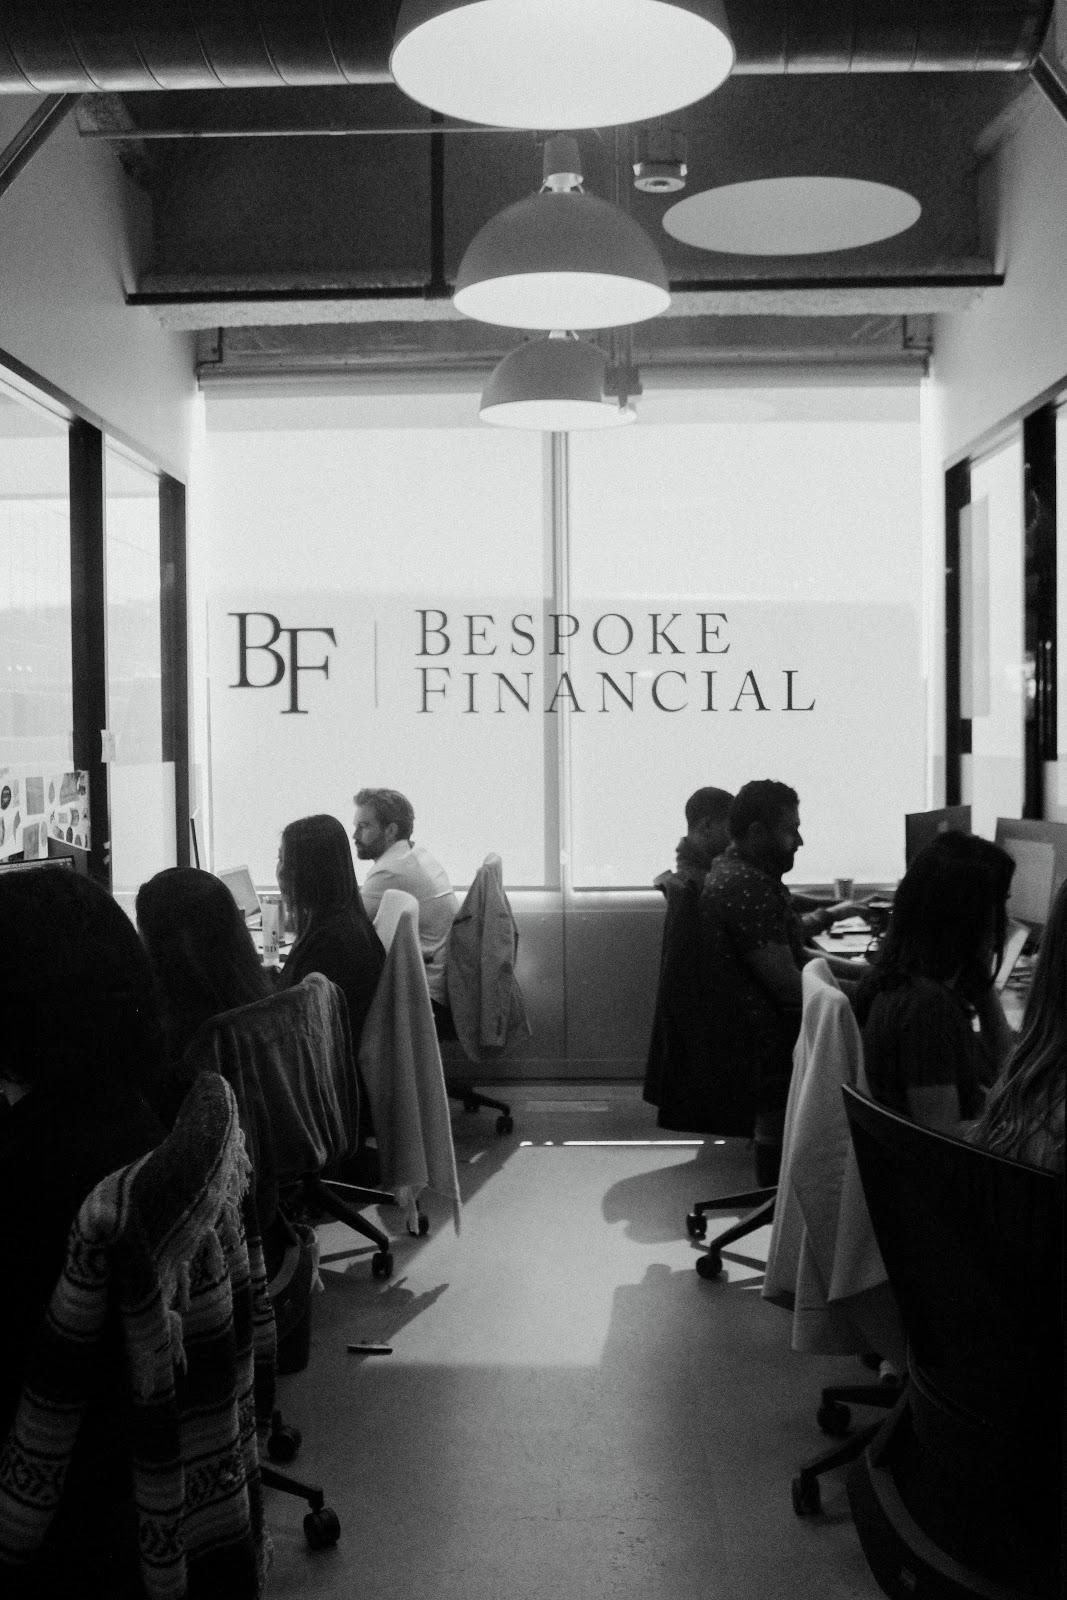 The Bespoke team at work